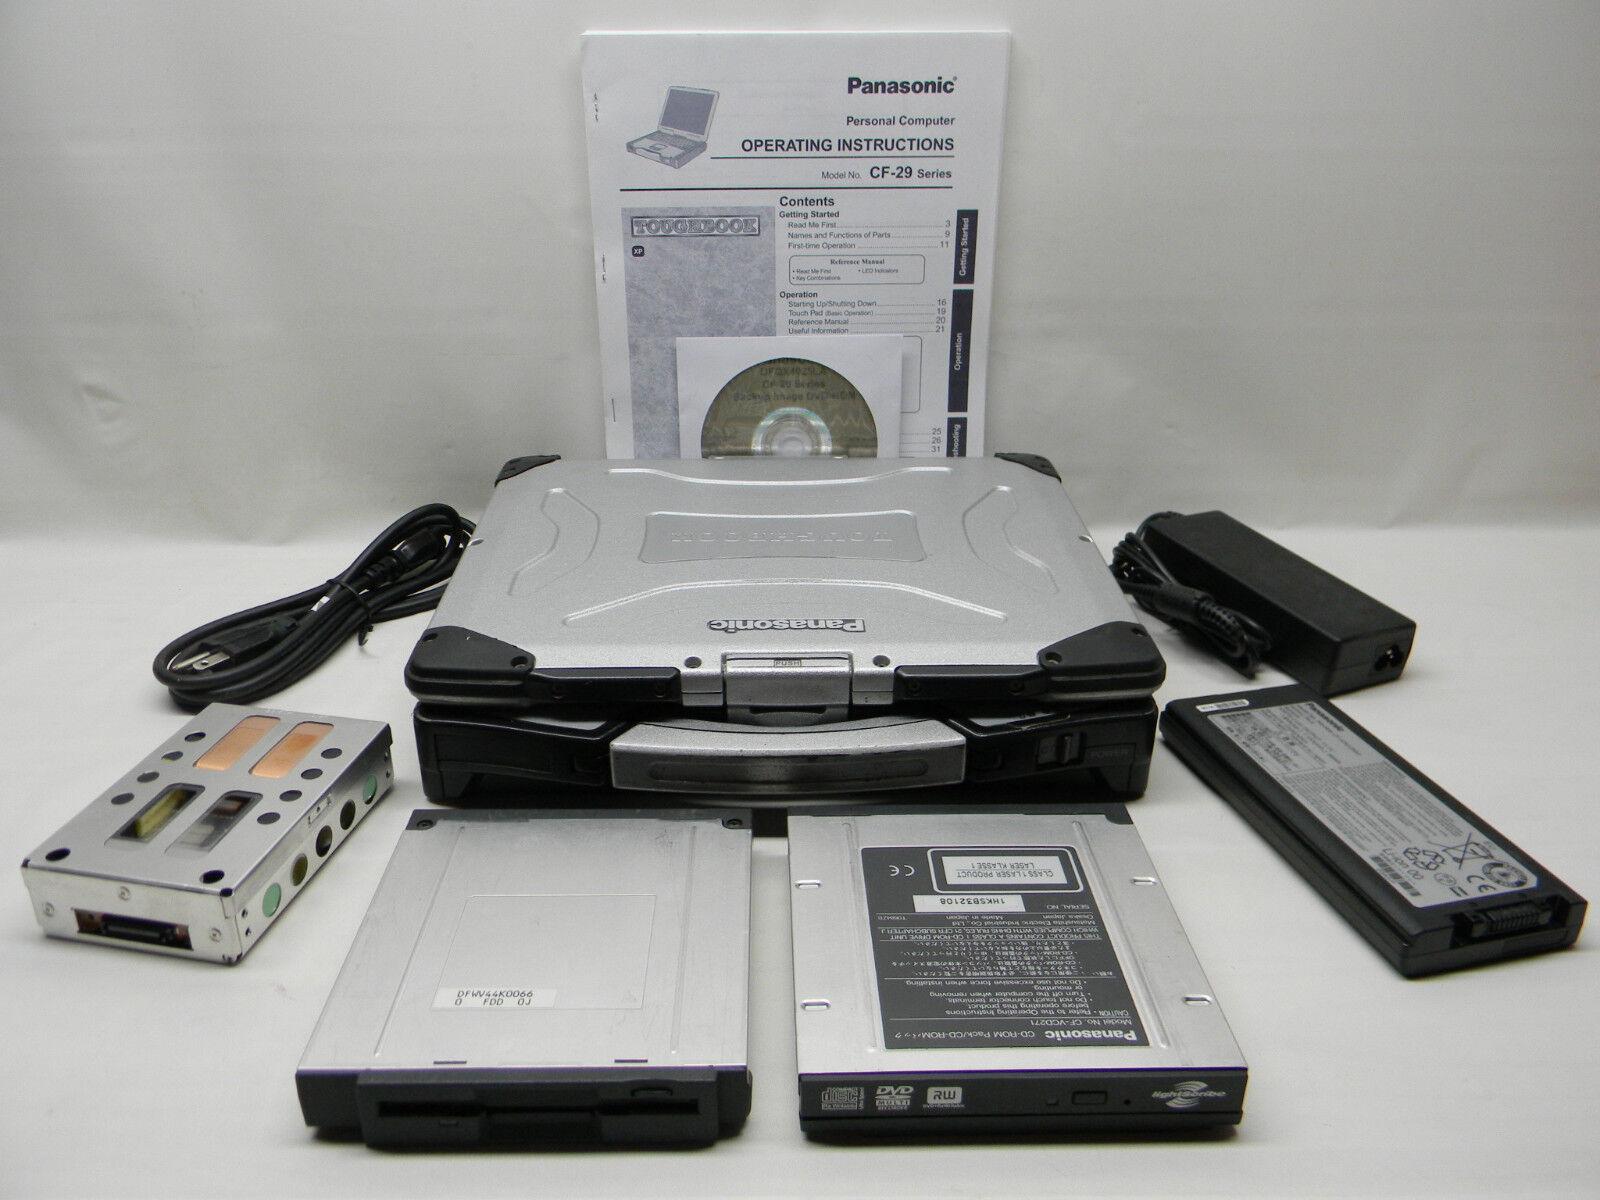 Panasonic Toughbook CF-29 Industrial/Commercial Laptop XP Pro #689